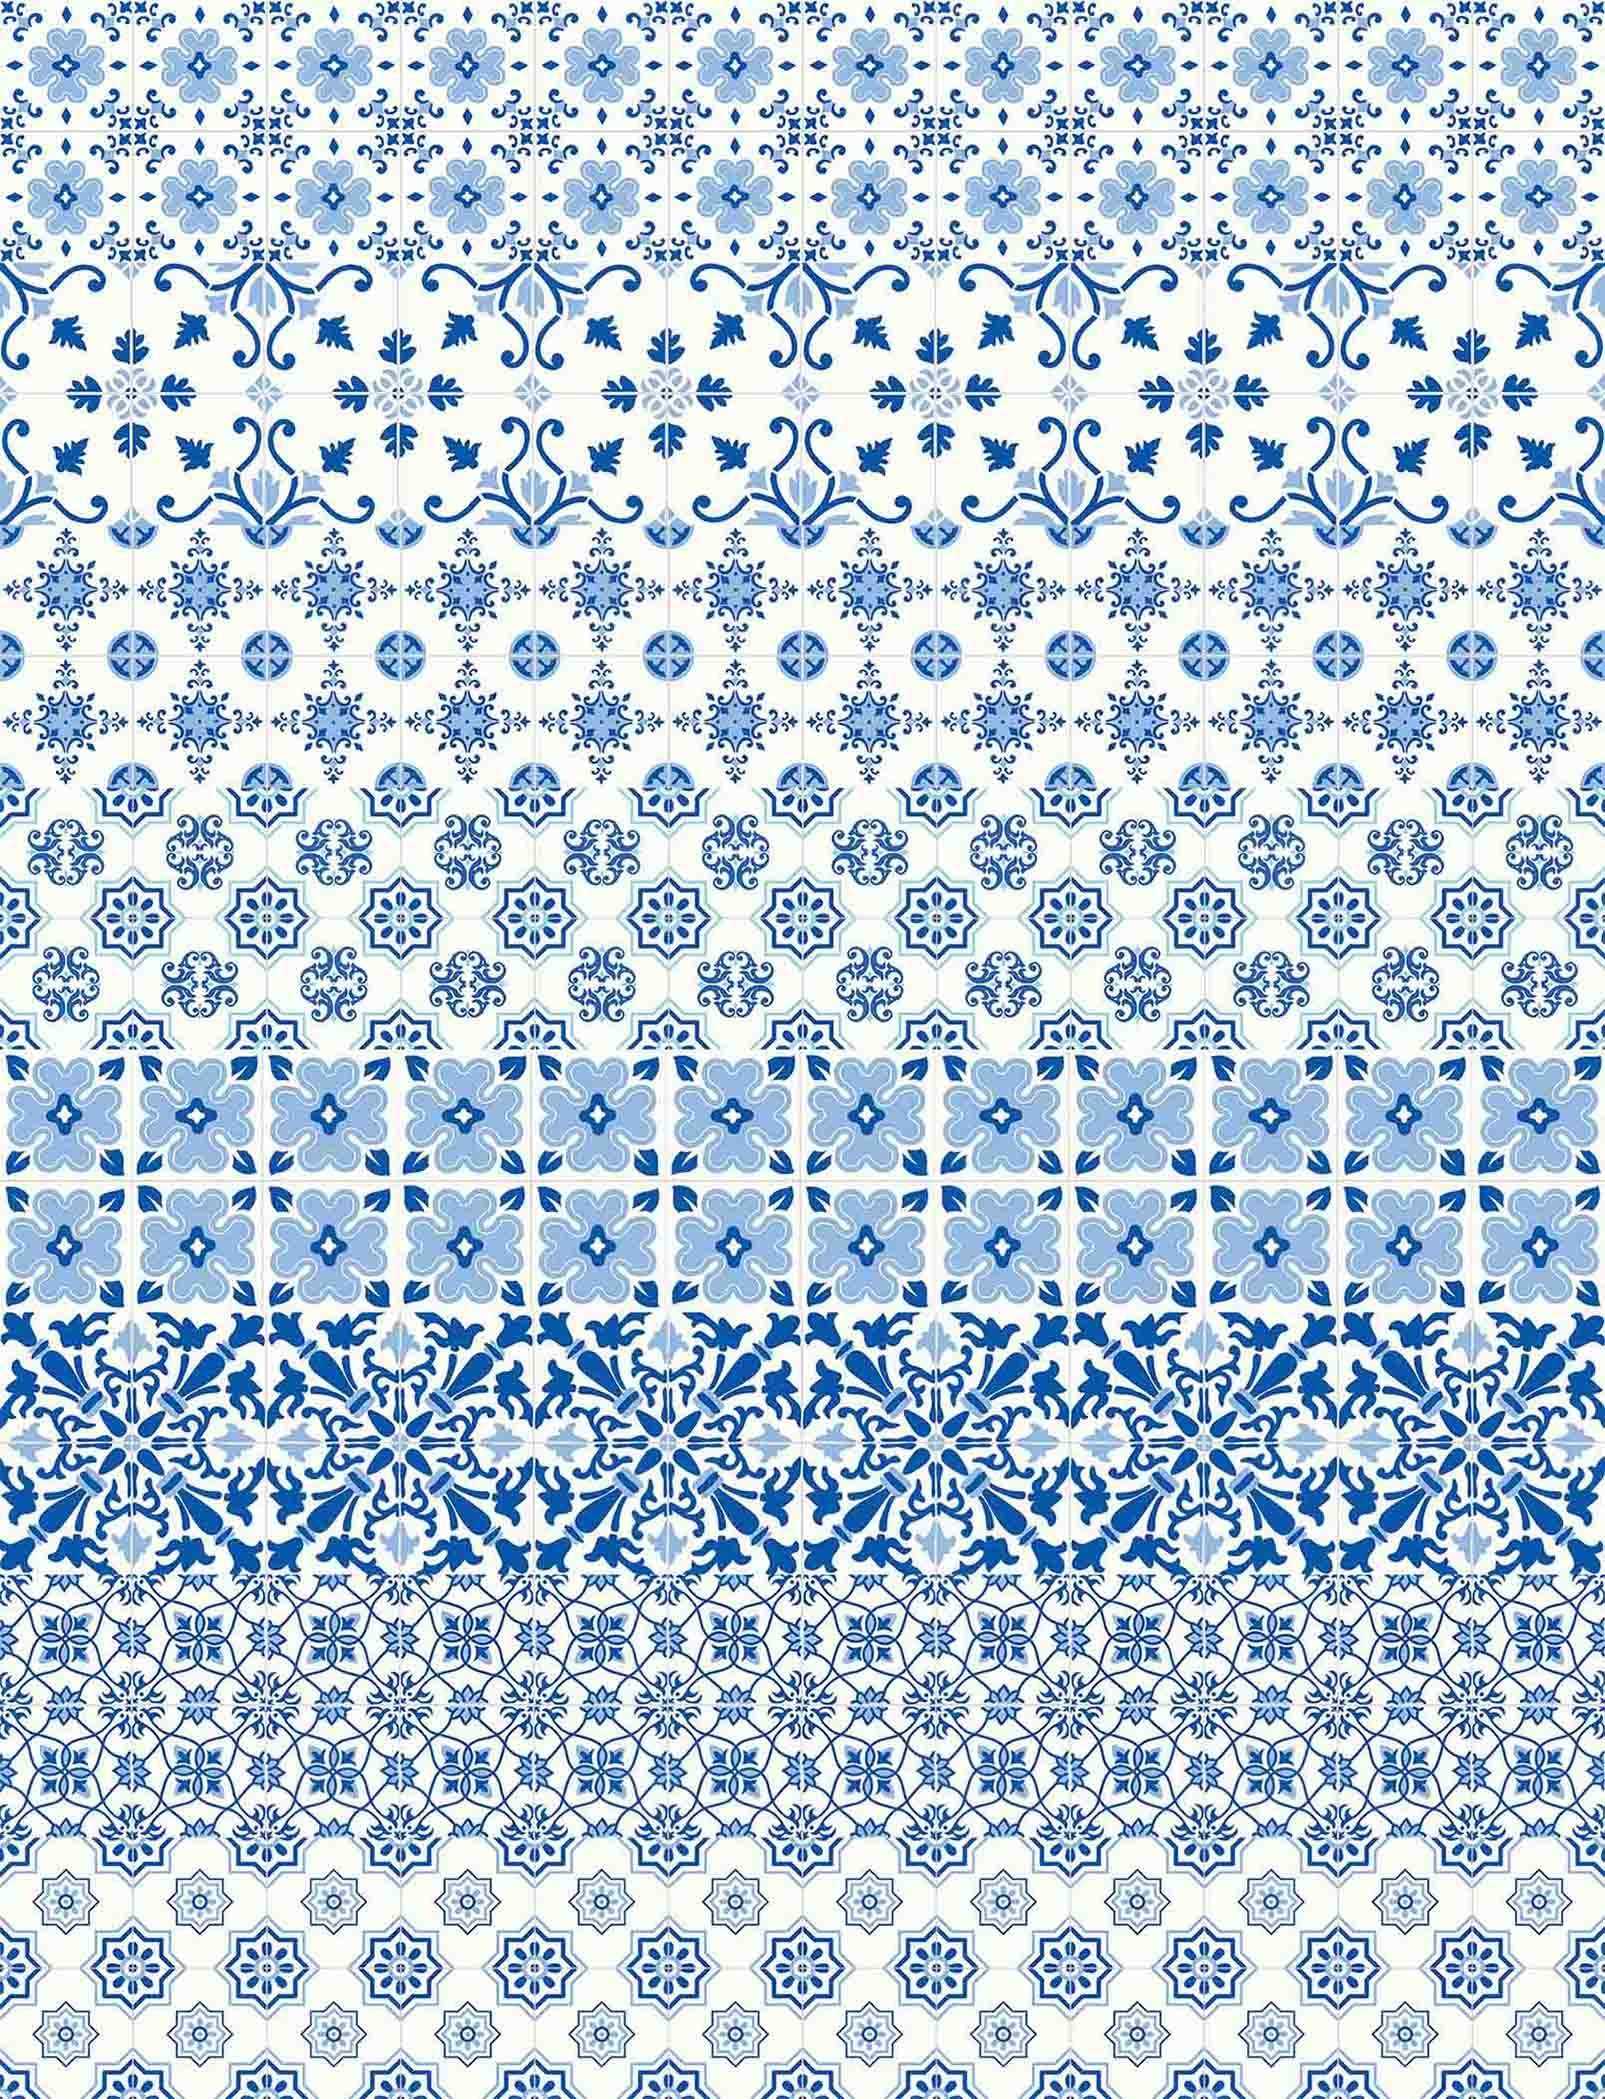 3D Clear Blue Pattern 7843 Stair Risers Decoration Photo Mural Vinyl Decal Wallpaper Murals Wallpaper Mural US Lemon (15x H:18cm x W:94cm (7''x37'')) by AJ WALLPAPER (Image #3)